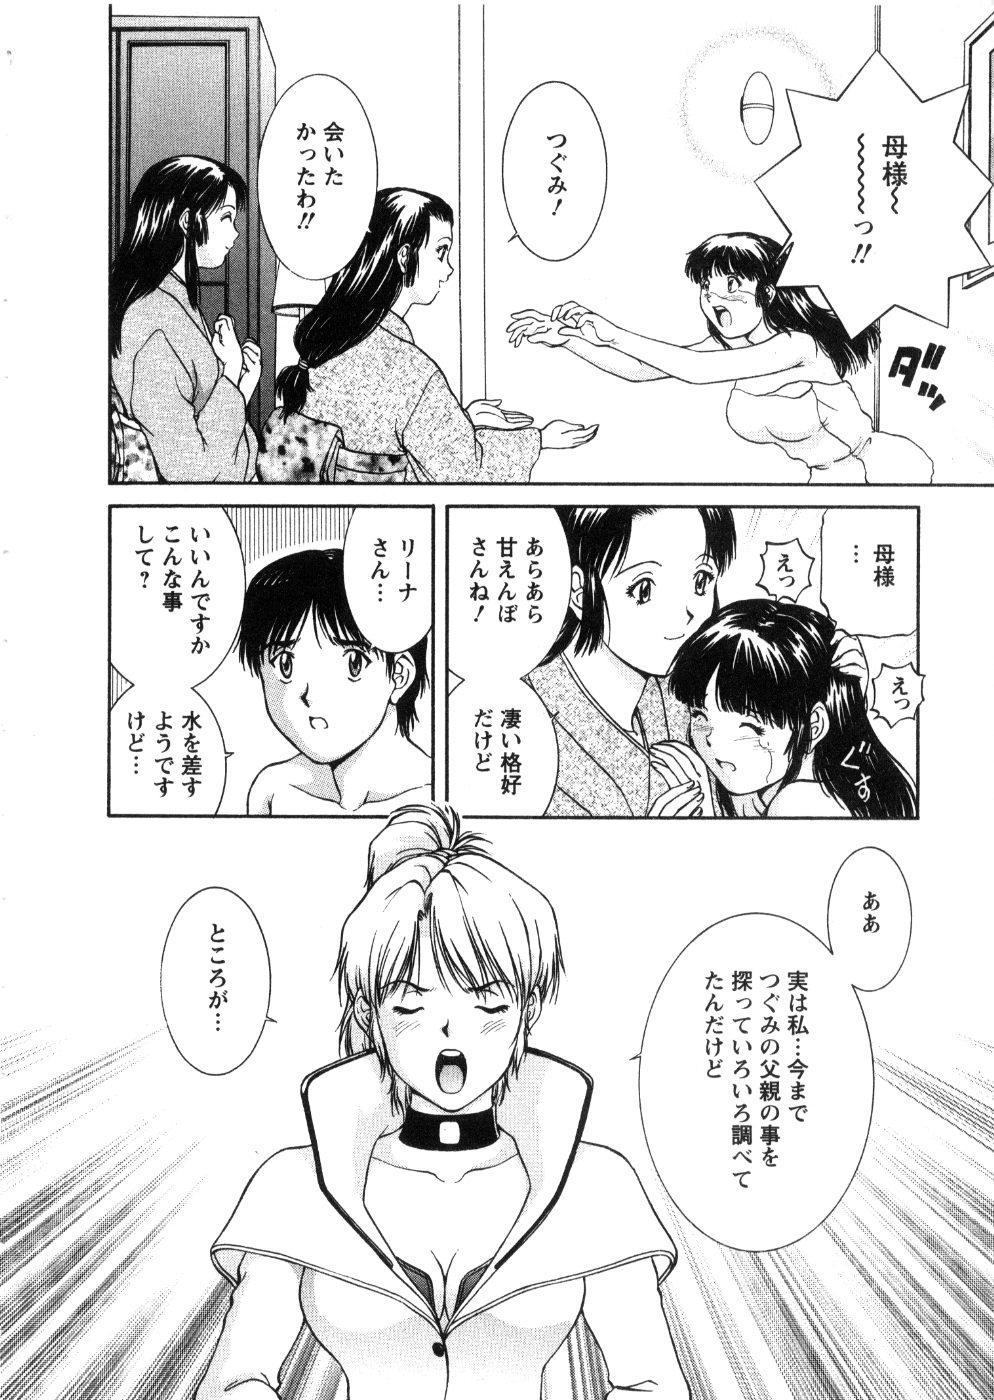 Oneechan-tachi ga Yatte Kuru 03 149